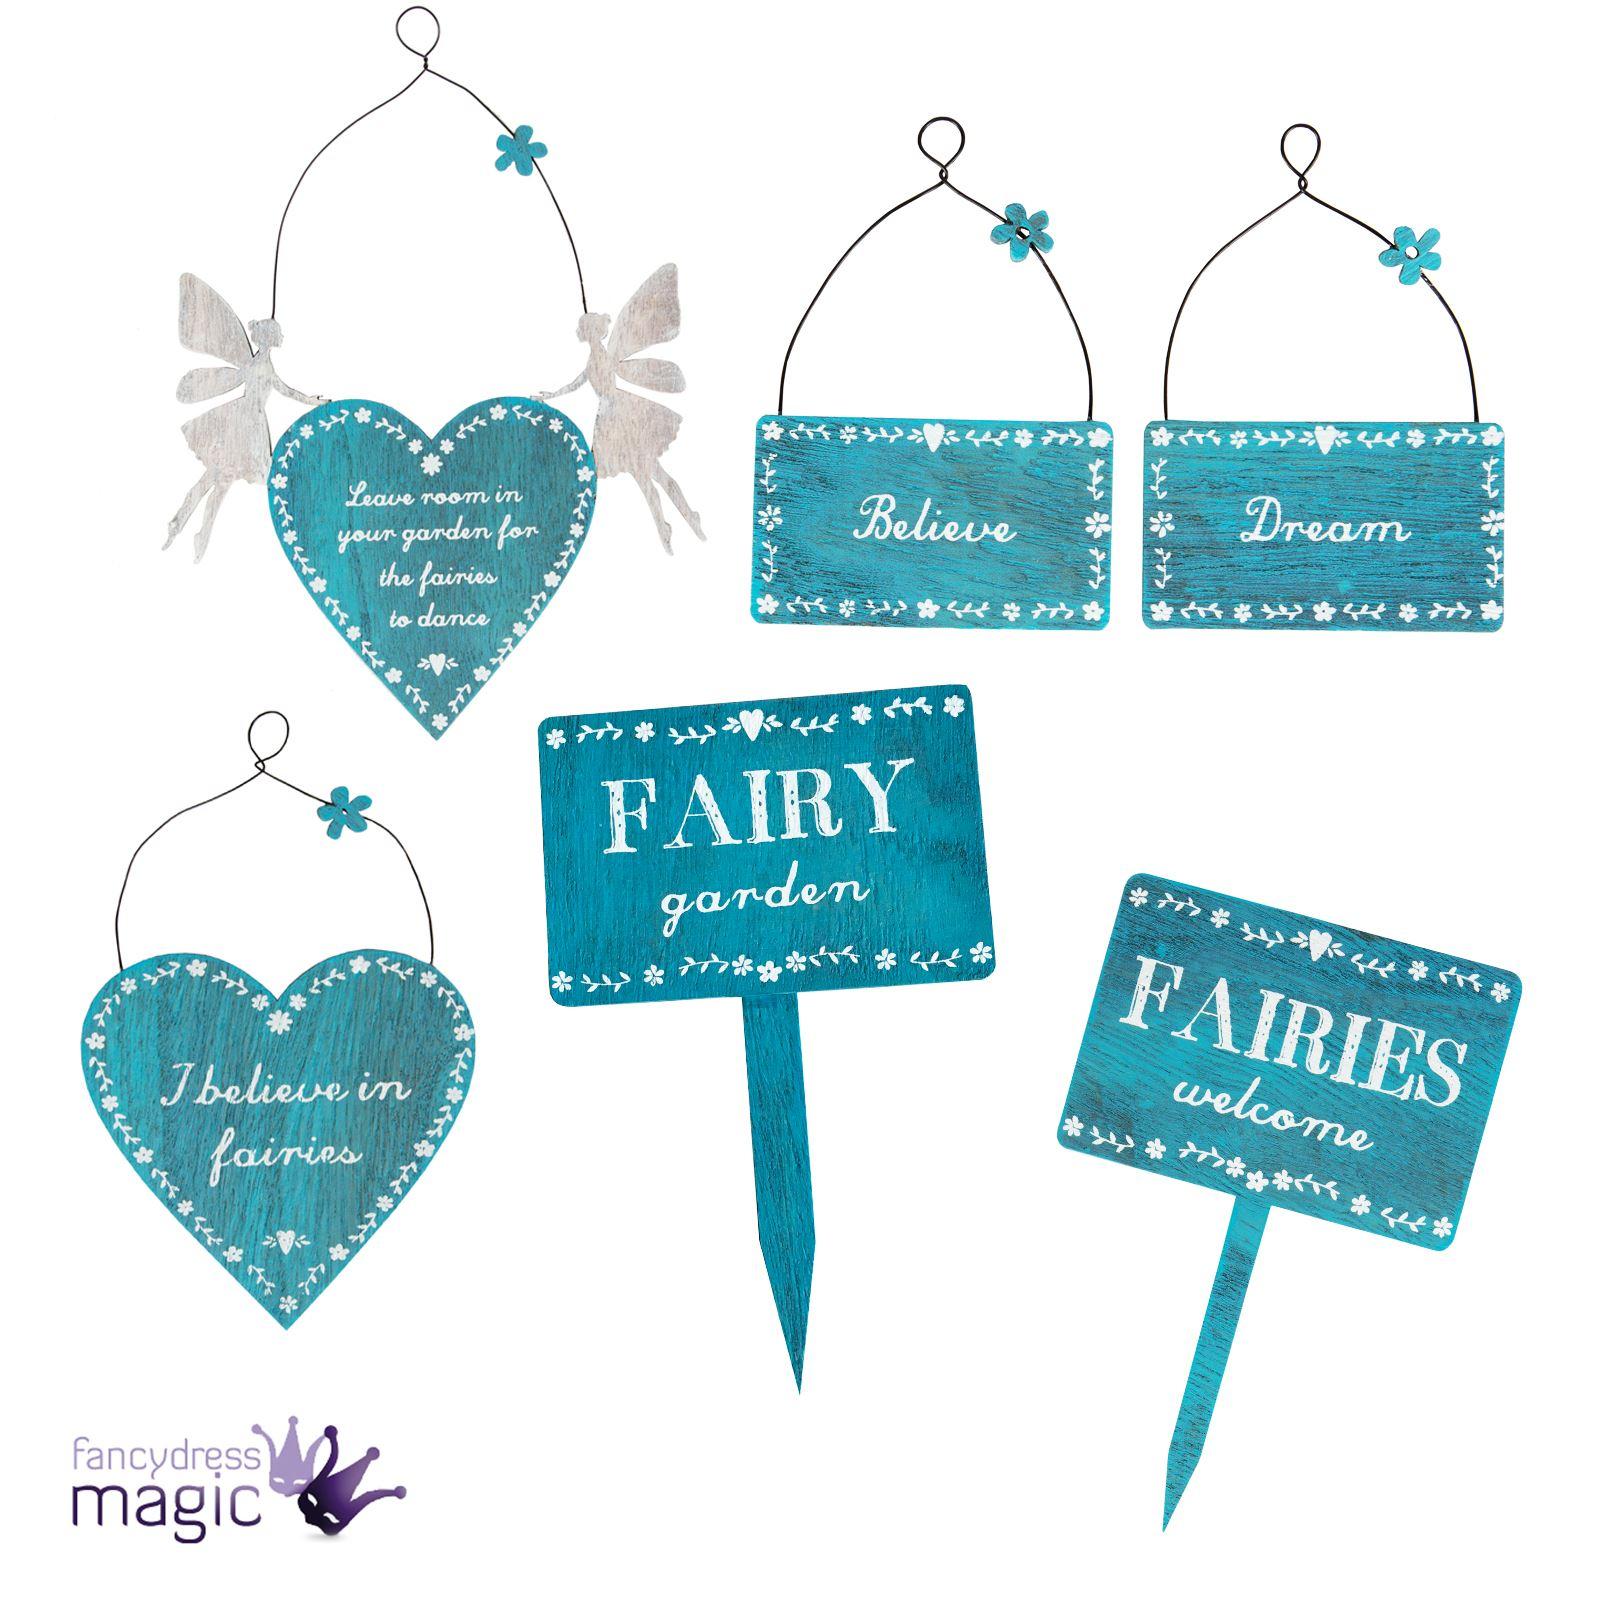 secret garden signs, sass & belle fairy fairies garden signs plaque decoration hanging, Design ideen